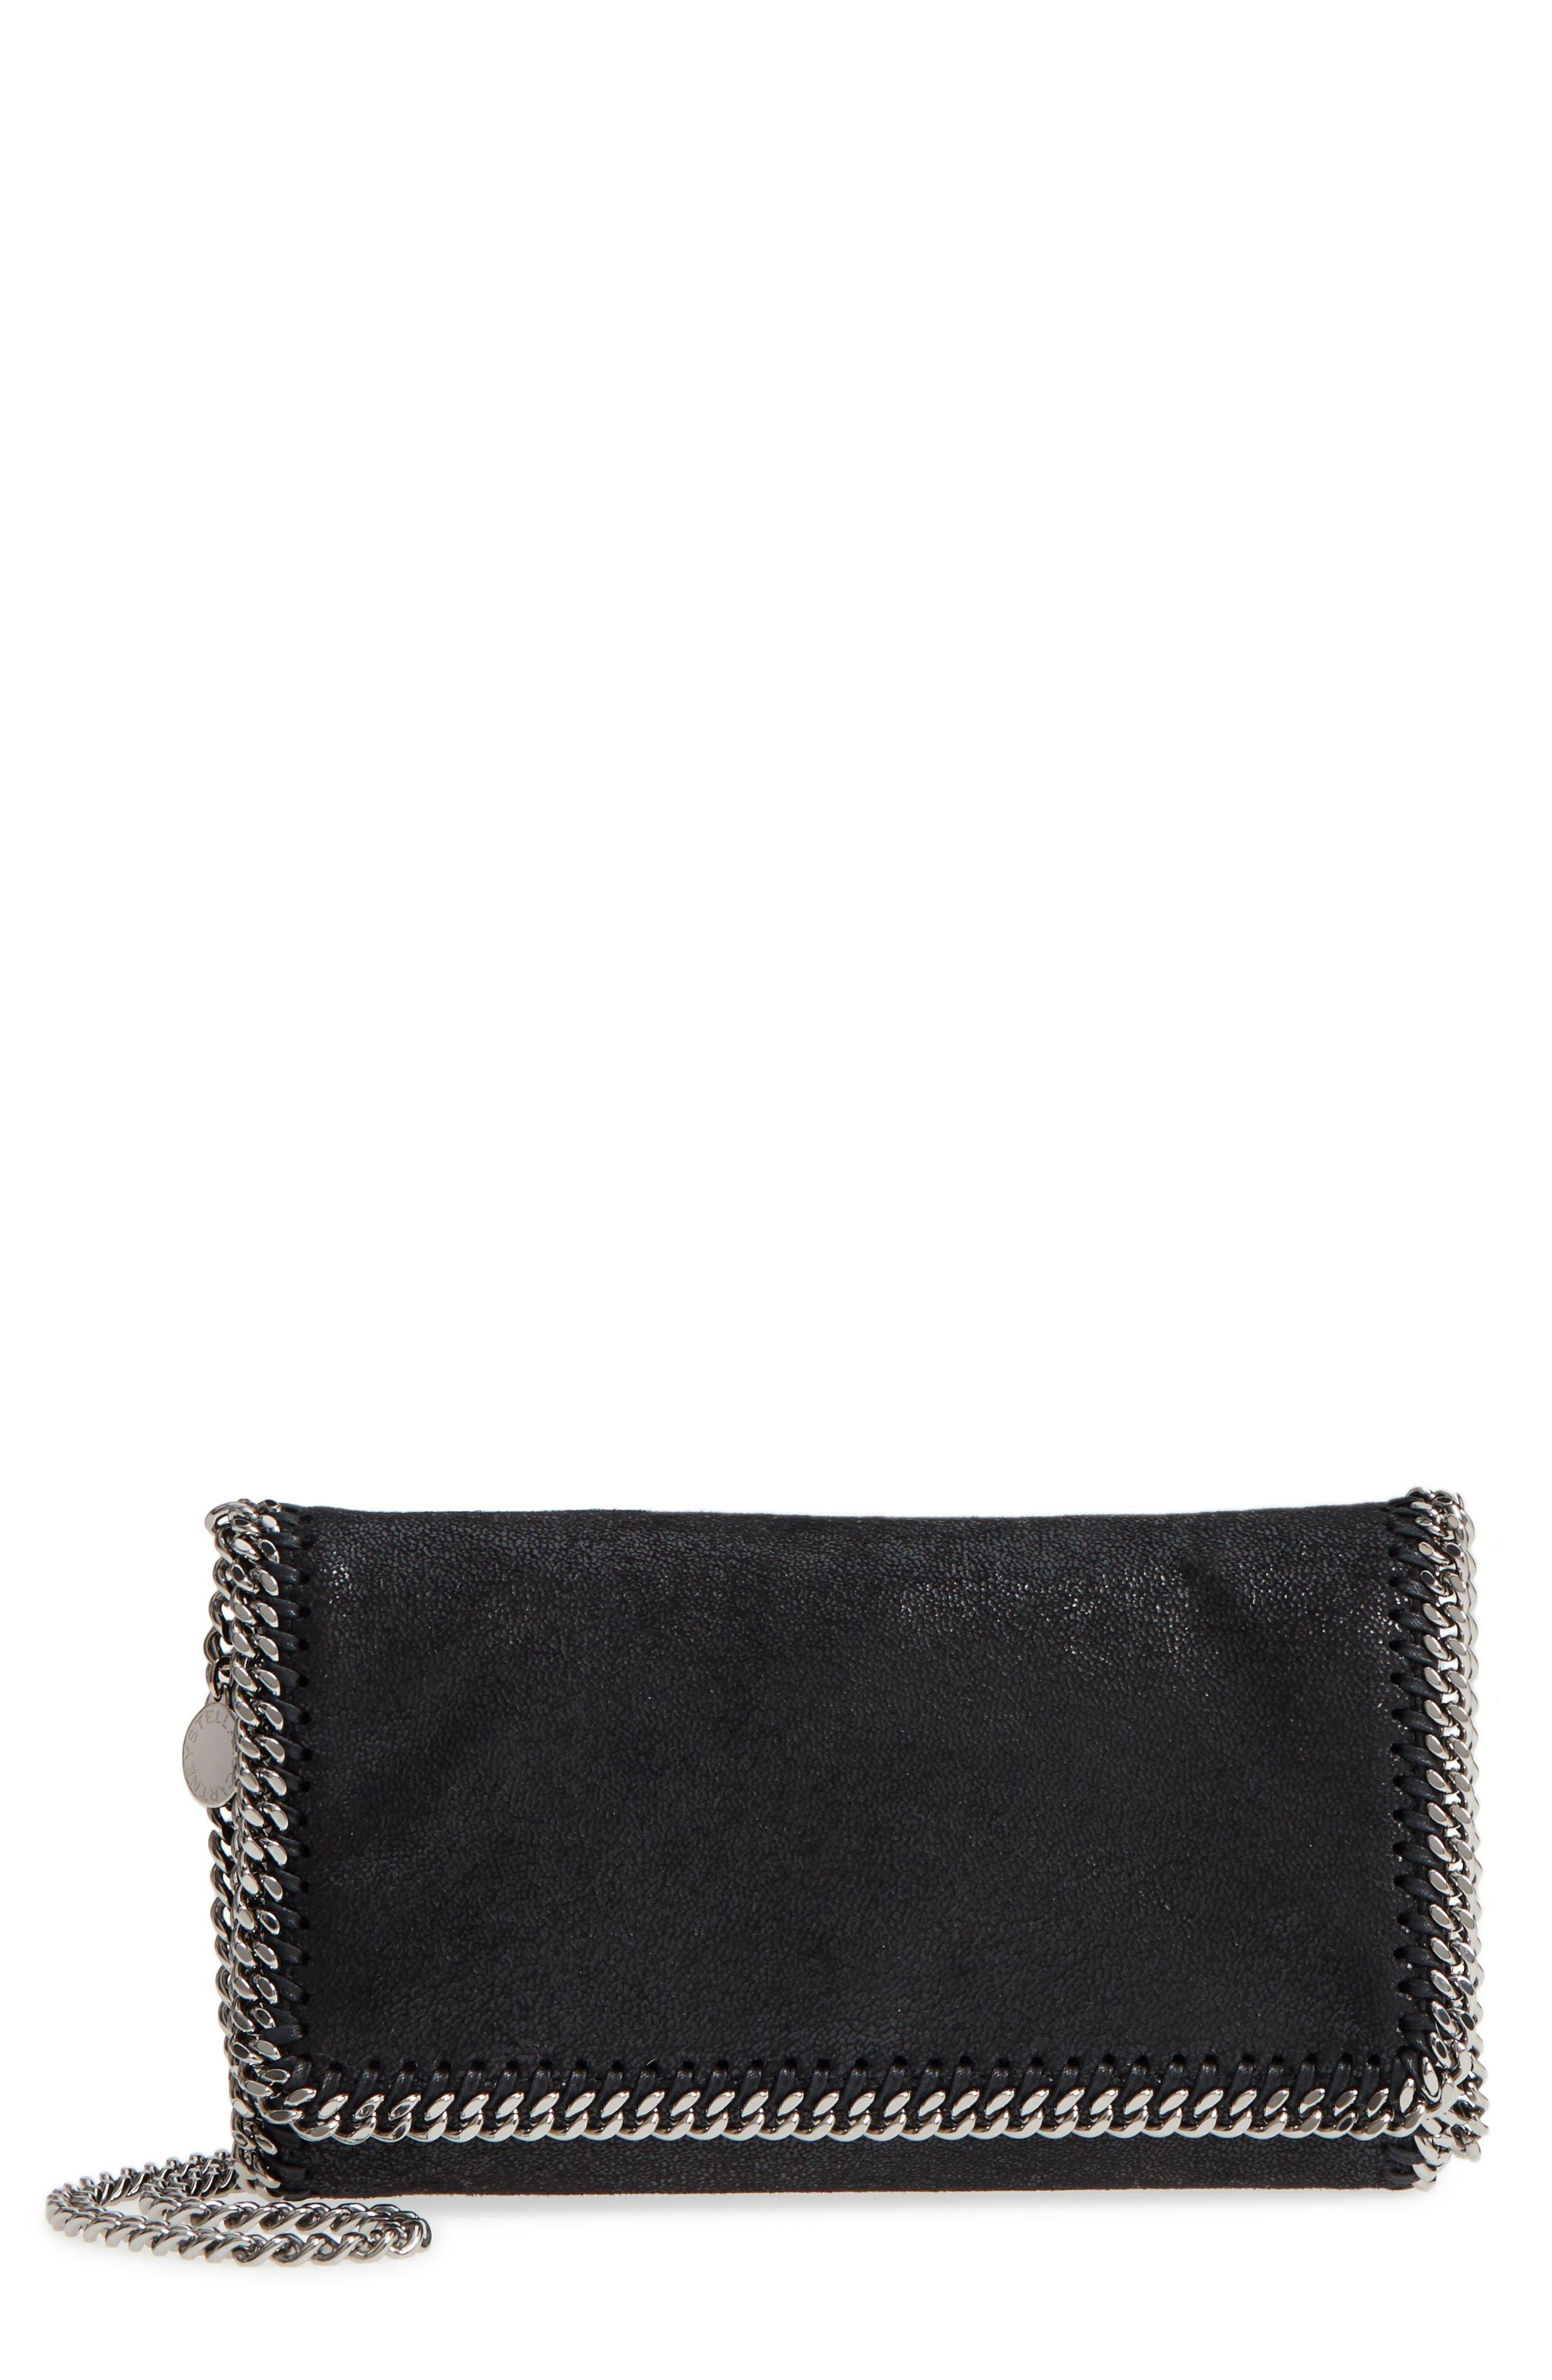 'Falabella - Shaggy Deer' Faux Leather Crossbody Bag,                             Main thumbnail 1, color,                             BLACK SLVR HRDWR